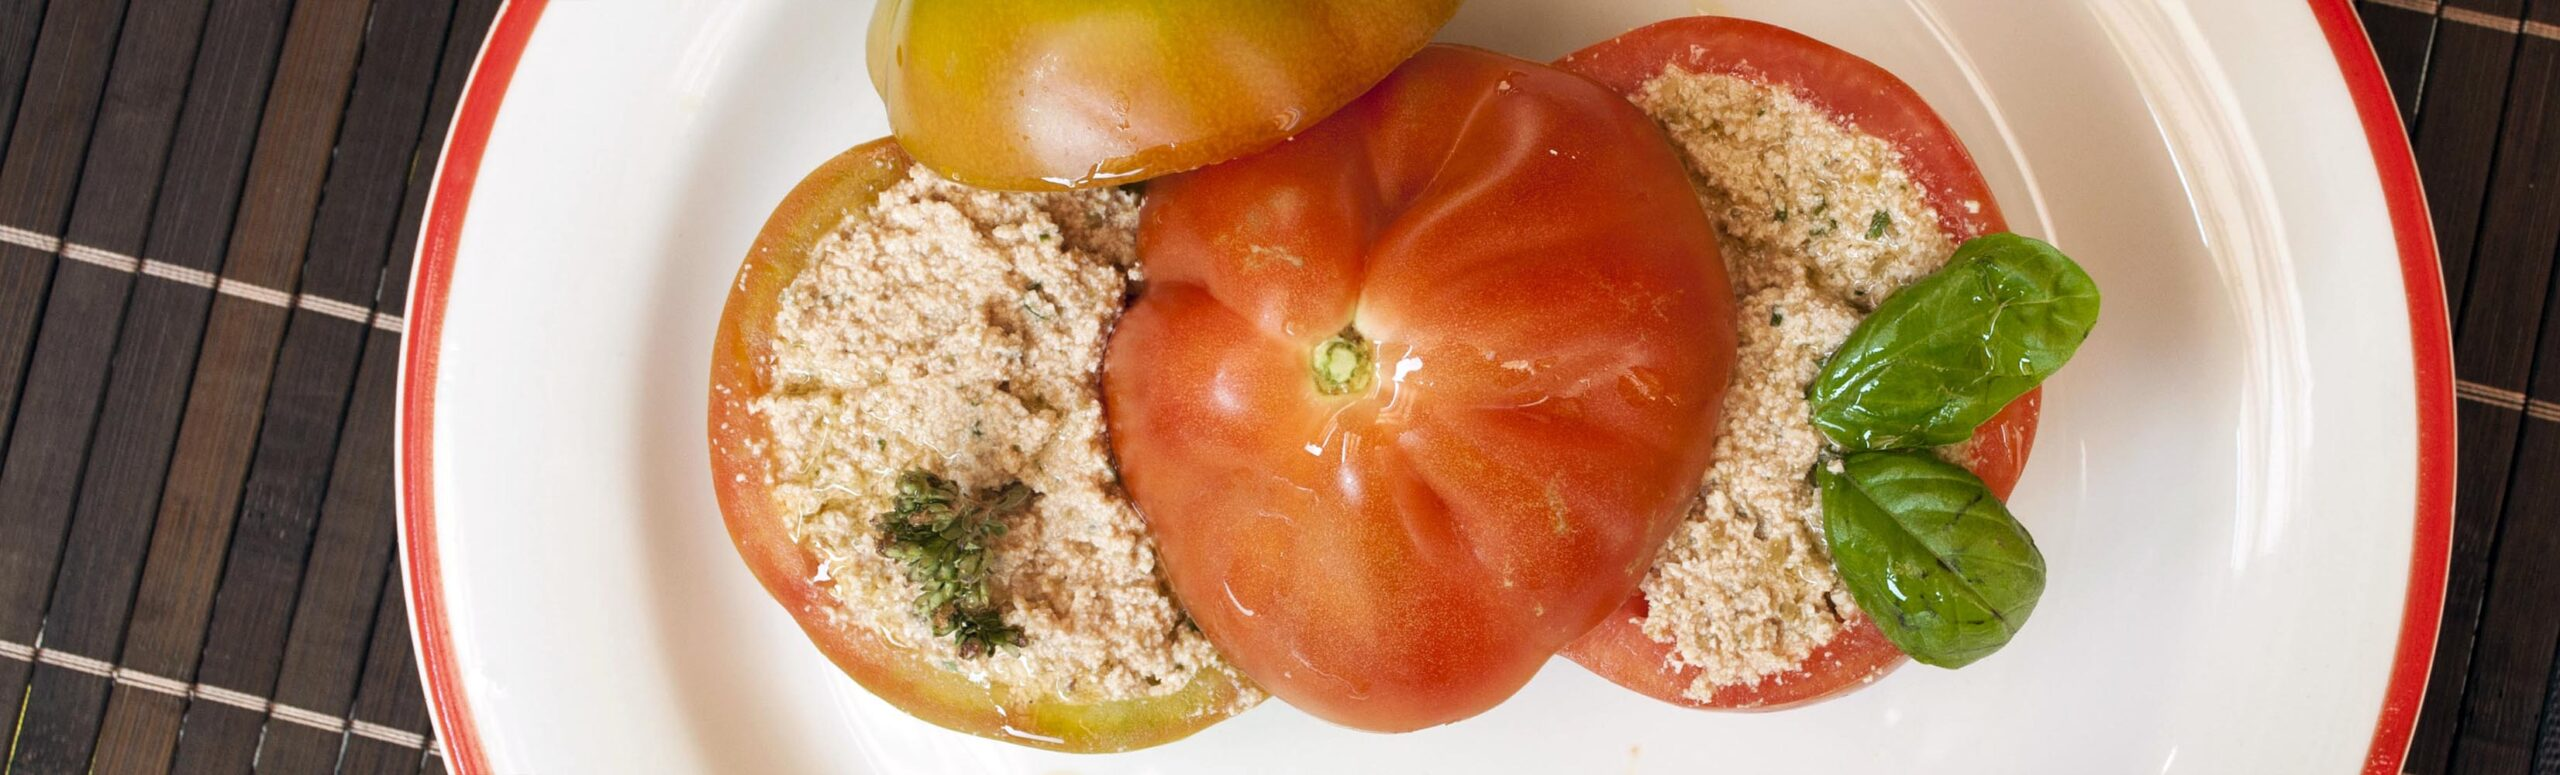 La ricetta dei pomodori freddi ripieni